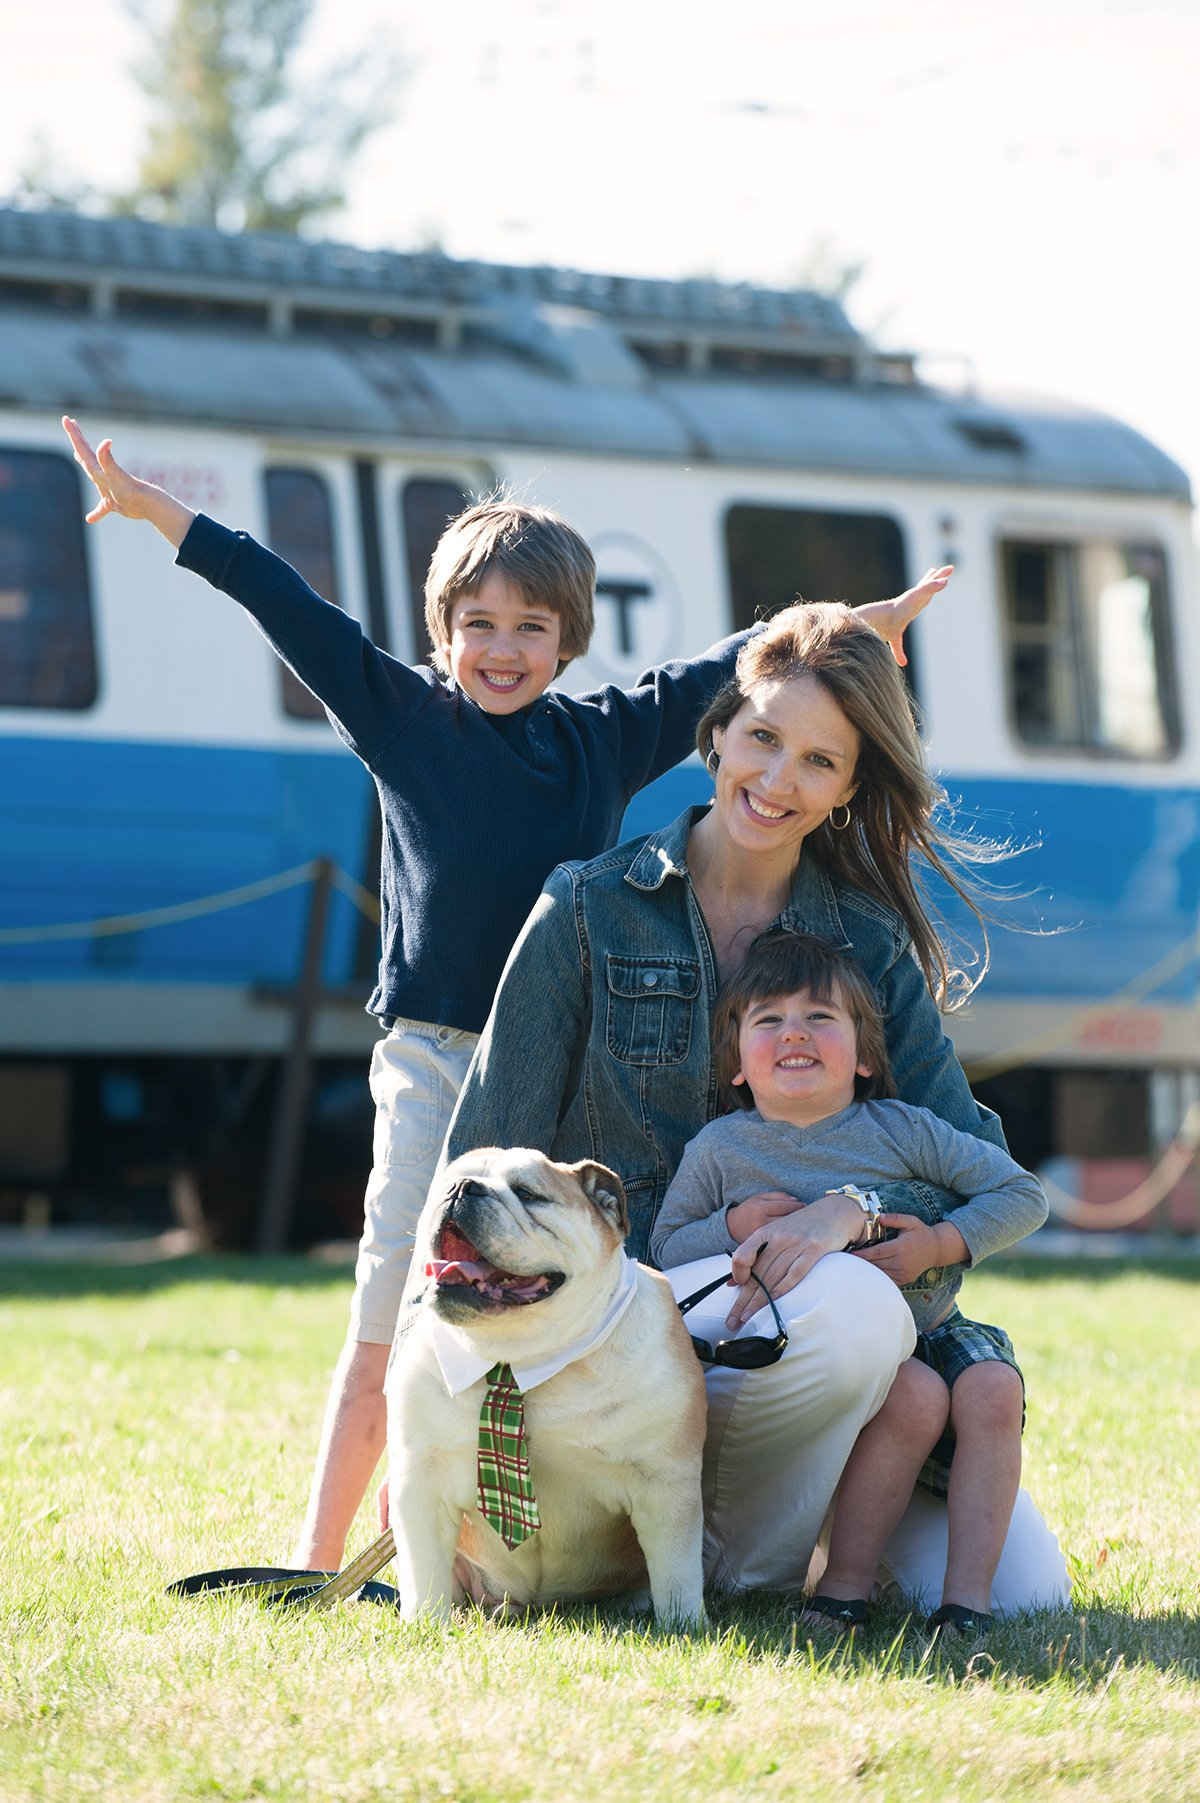 Family enjoying a day at Seashore Trolley Museum